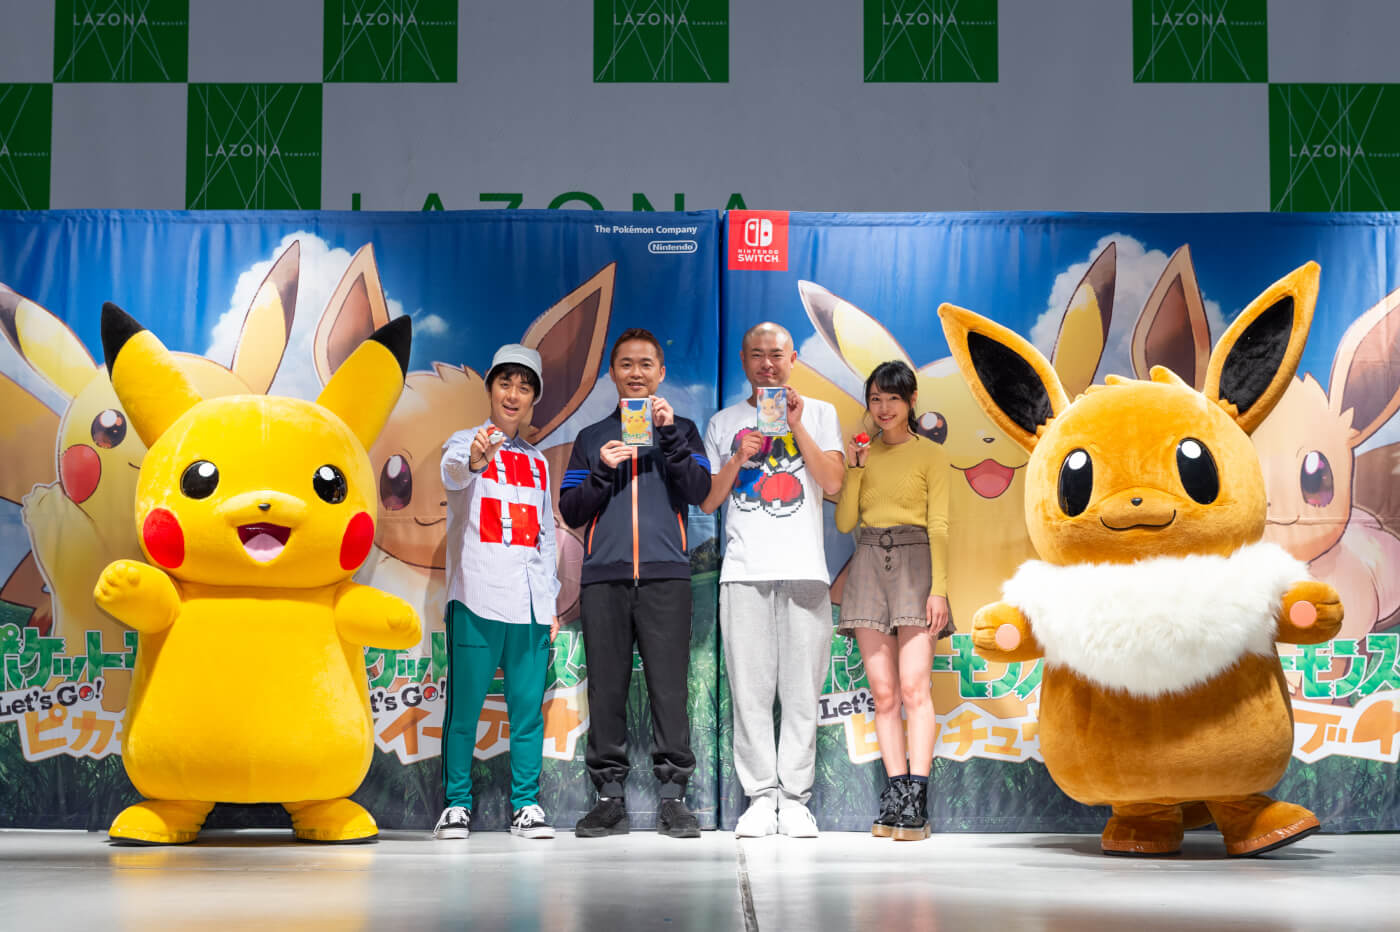 Nintendo Switch「精靈寶可夢 Let's Go! 皮卡丘・Let's Go! 伊布」發售 精靈寶可夢、